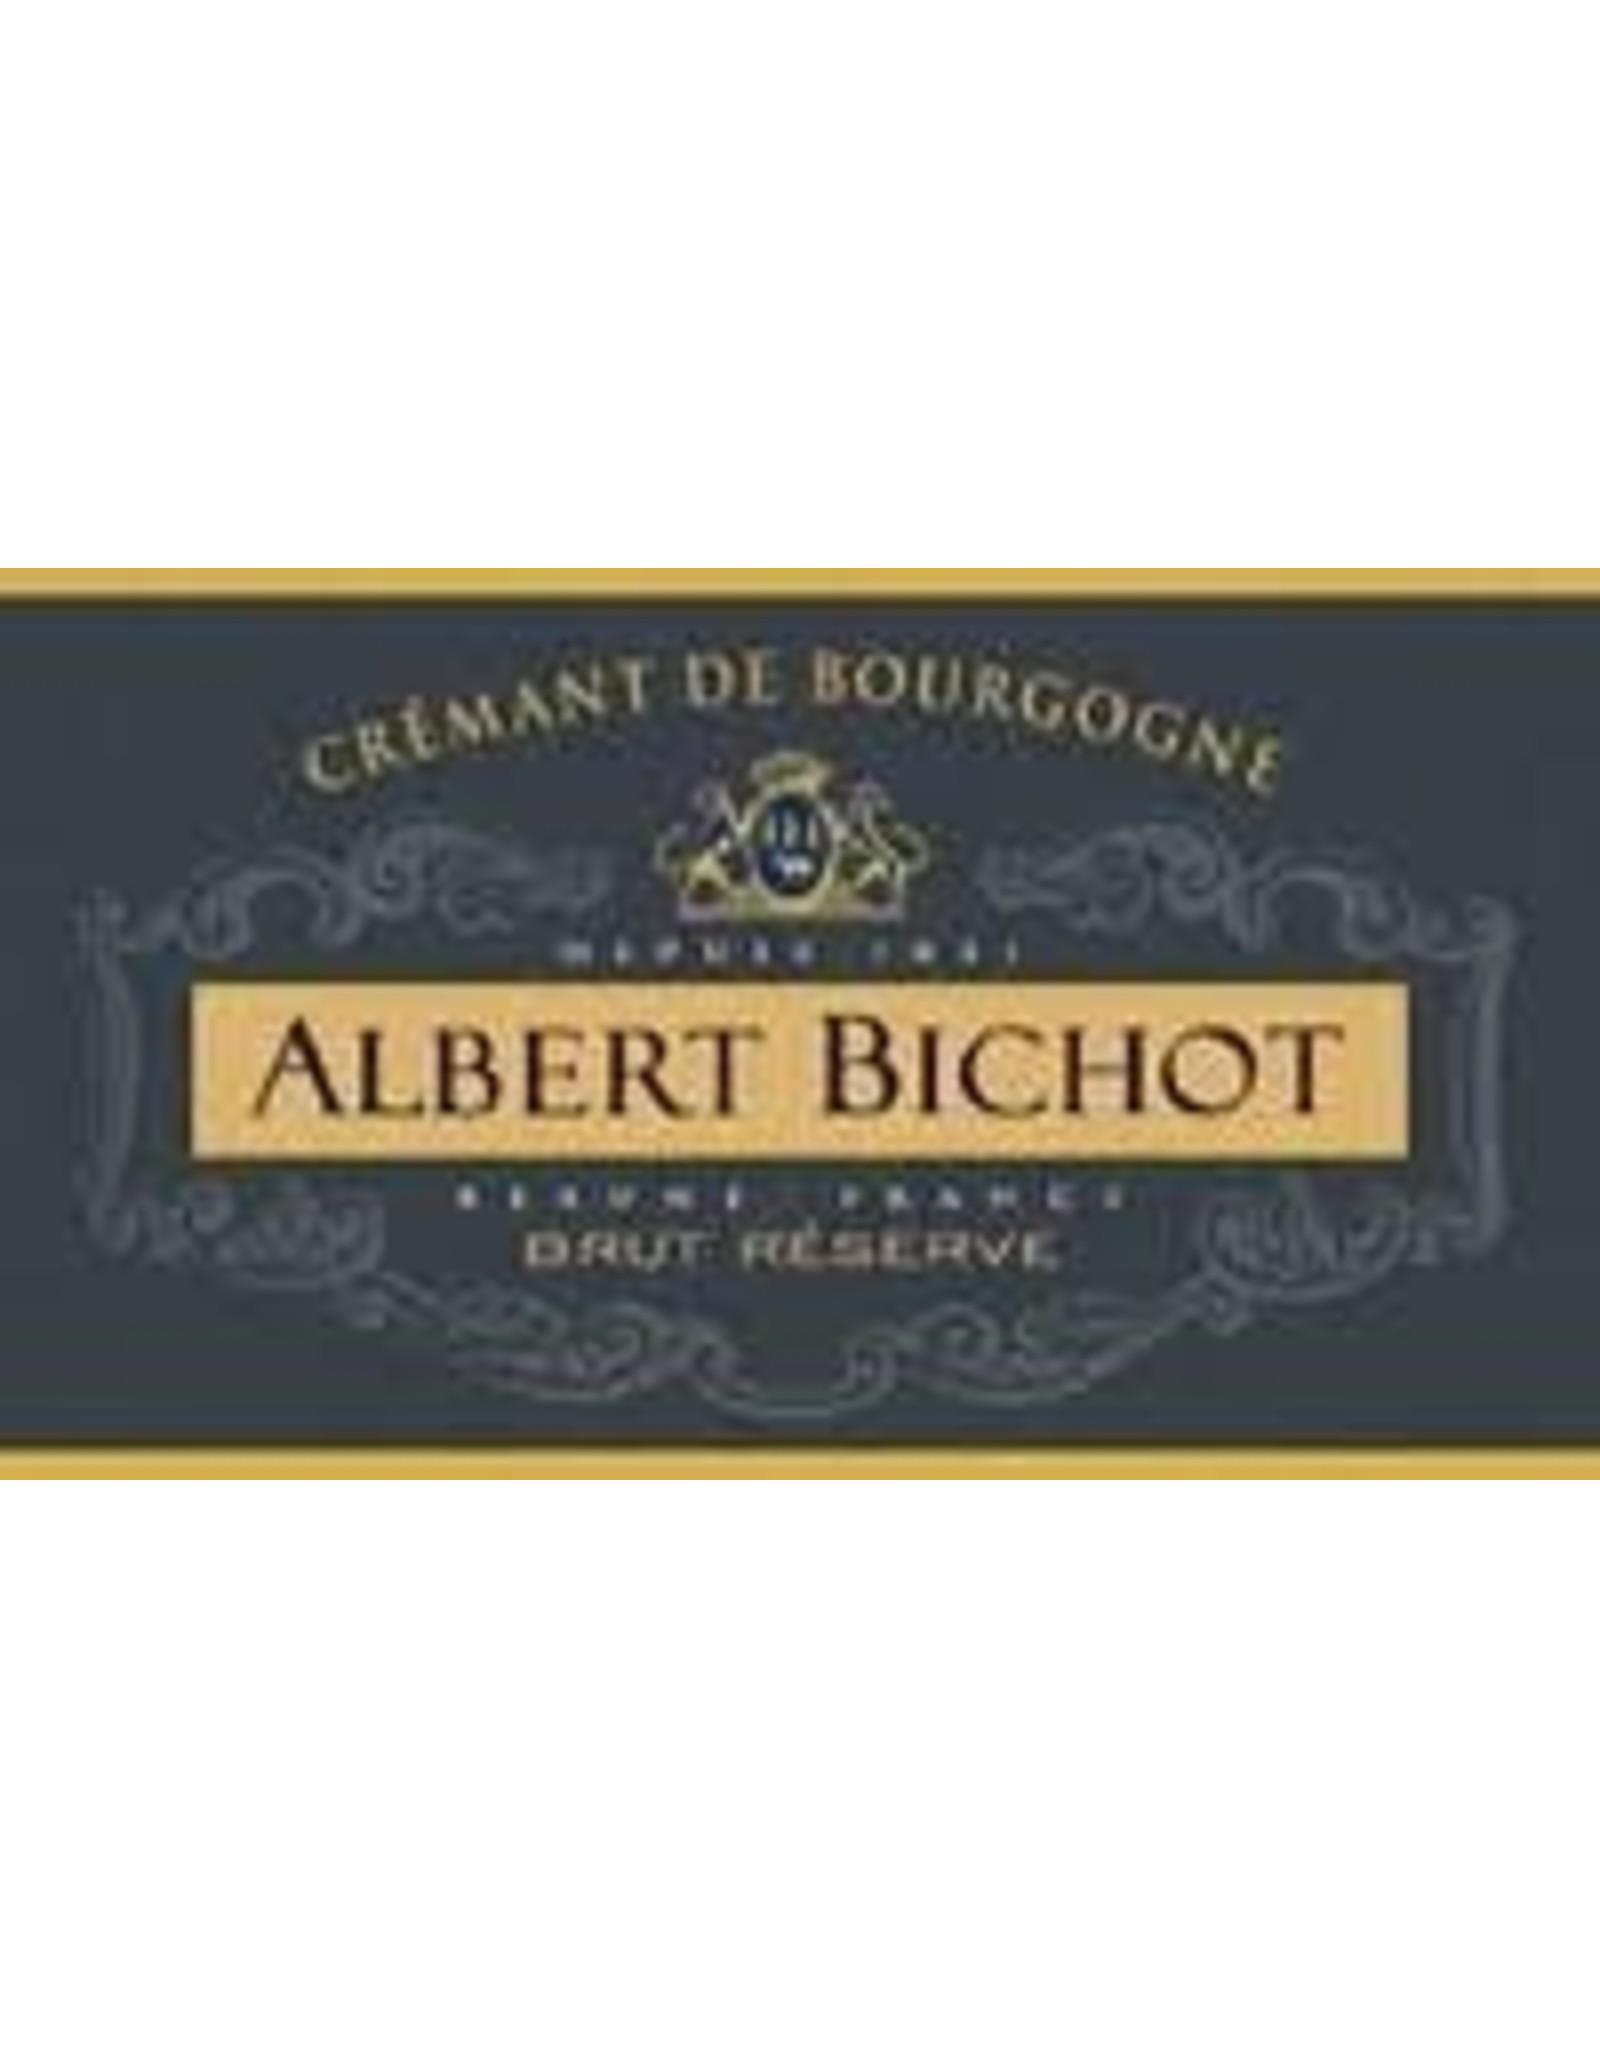 Albert Bichot Albert Bichot Cremant de Bourgogne, NV